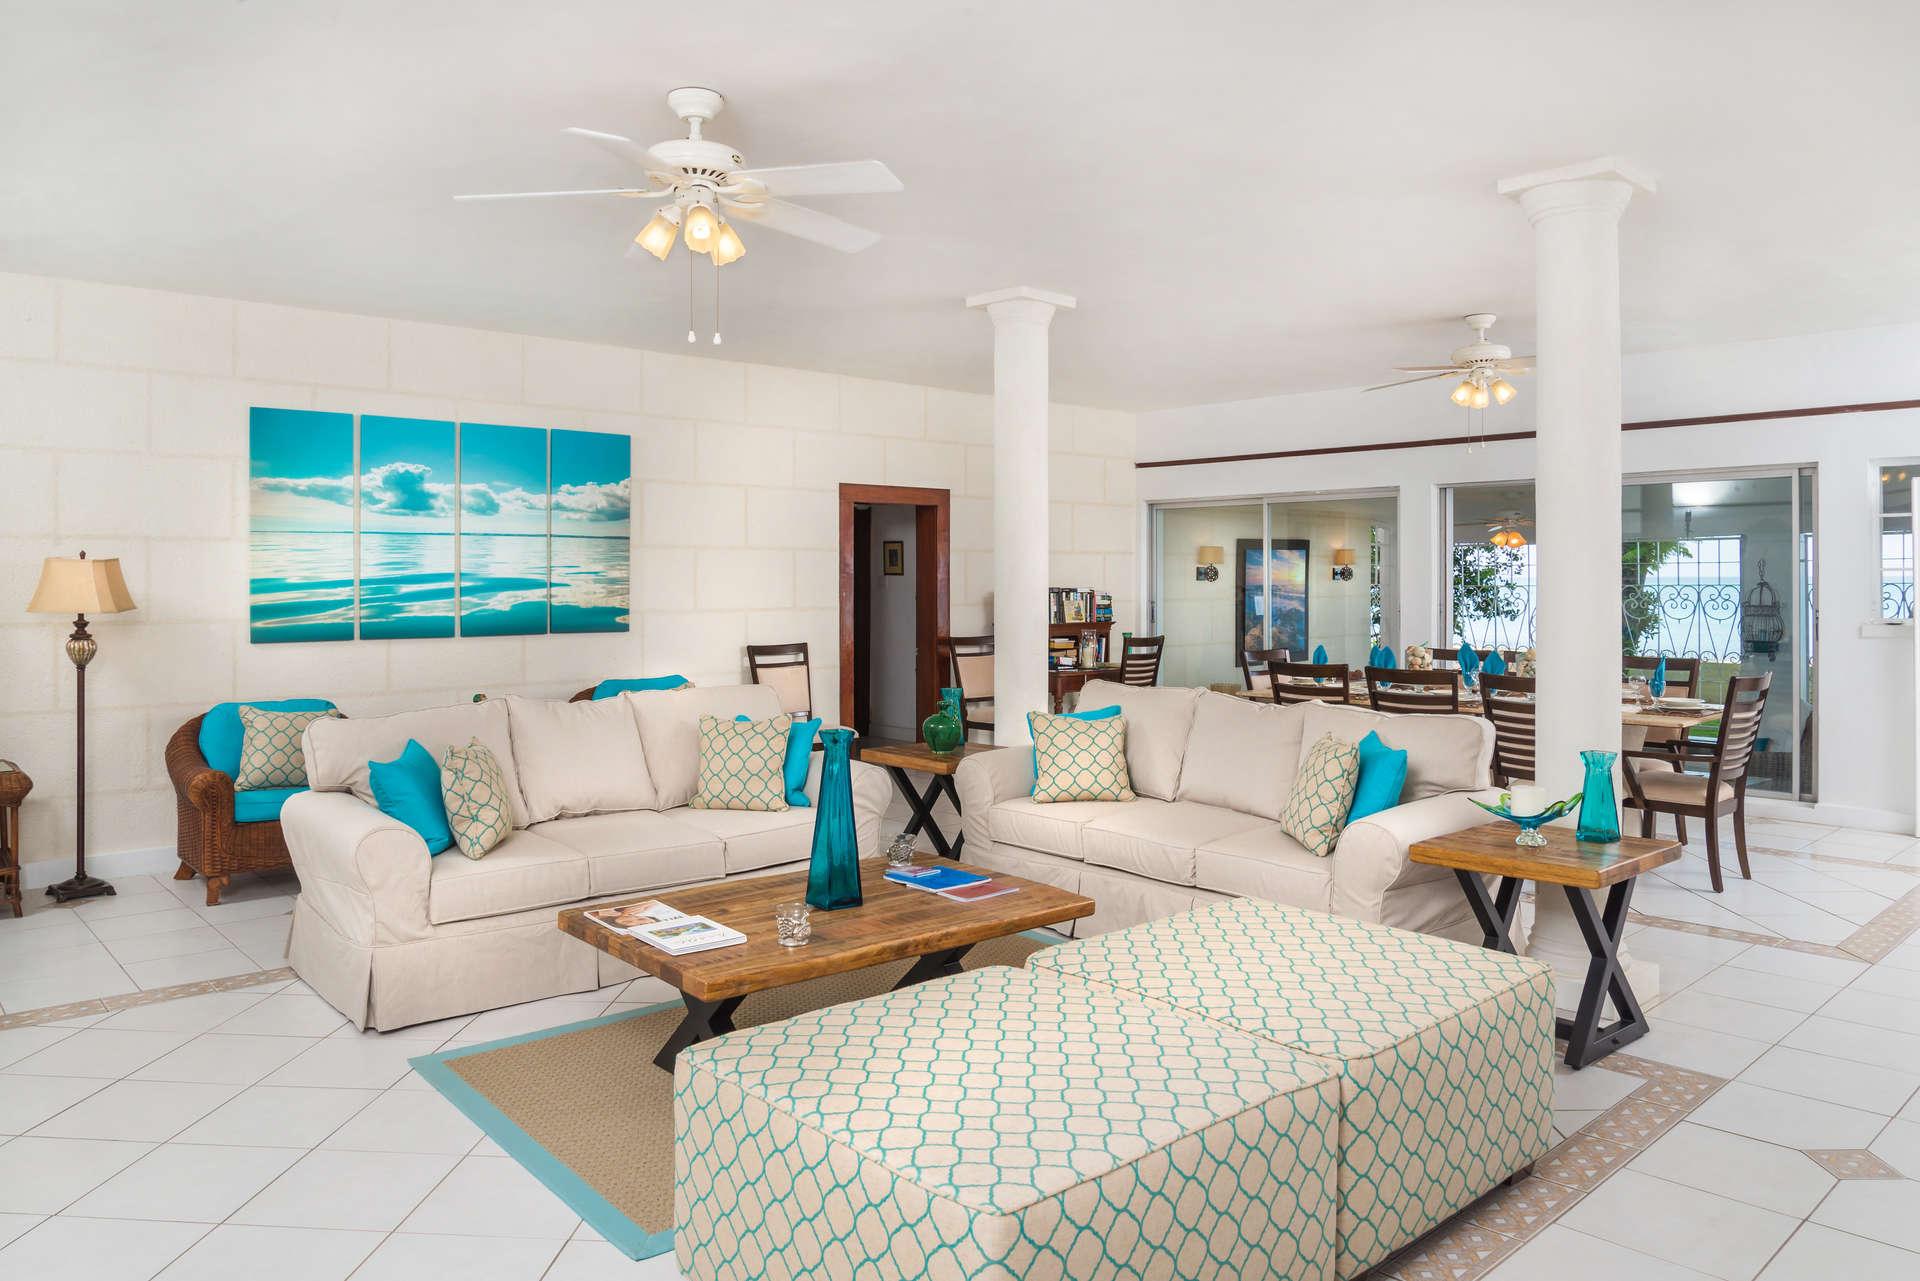 Luxury villa rentals caribbean - Barbados - St james - Sandy lane - West We Go - Image 1/14